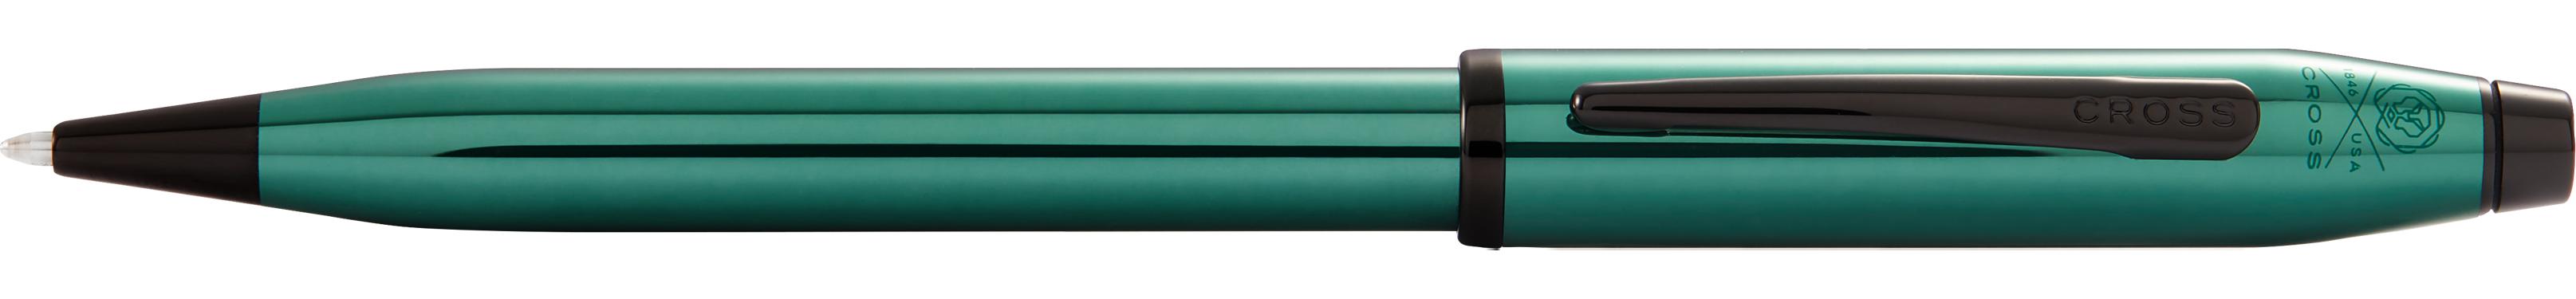 Century II Translucent Green Lacquer Ballpoint Pen